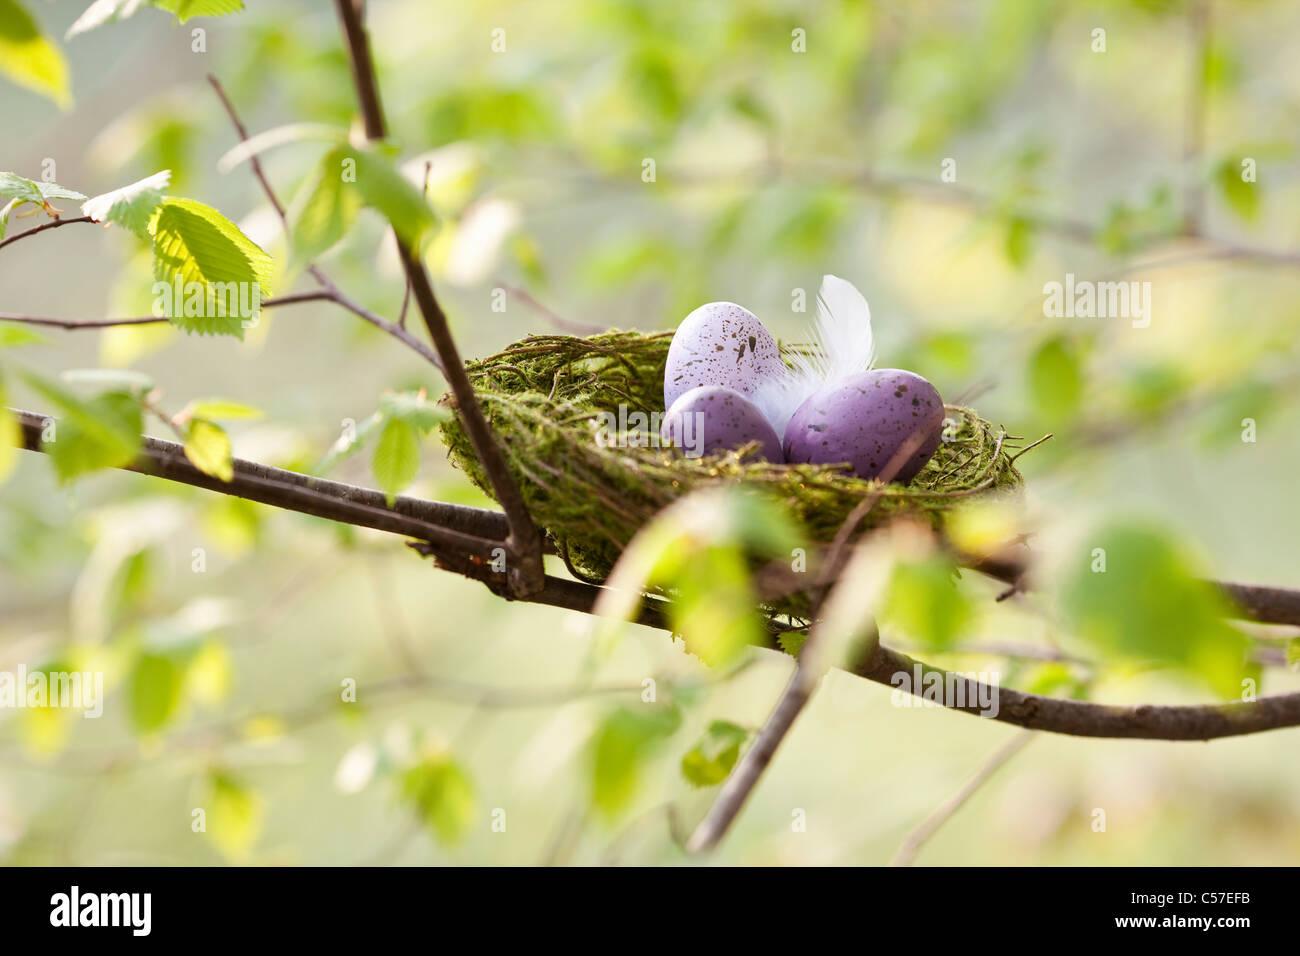 Speckled eggs in bird's nest - Stock Image